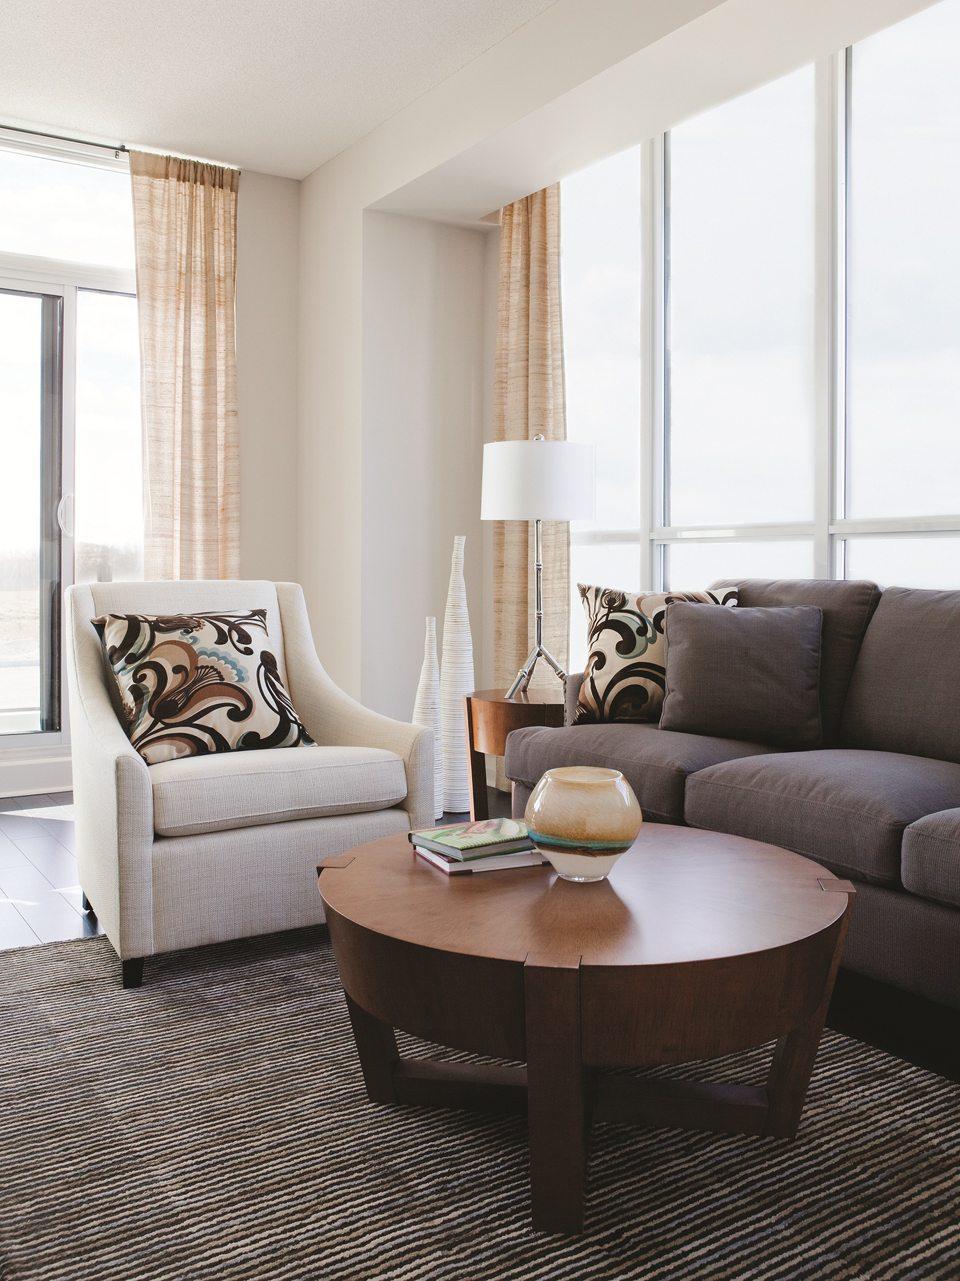 Pinnacle Uptown Crystal Condominiums Room View Toronto, Canada